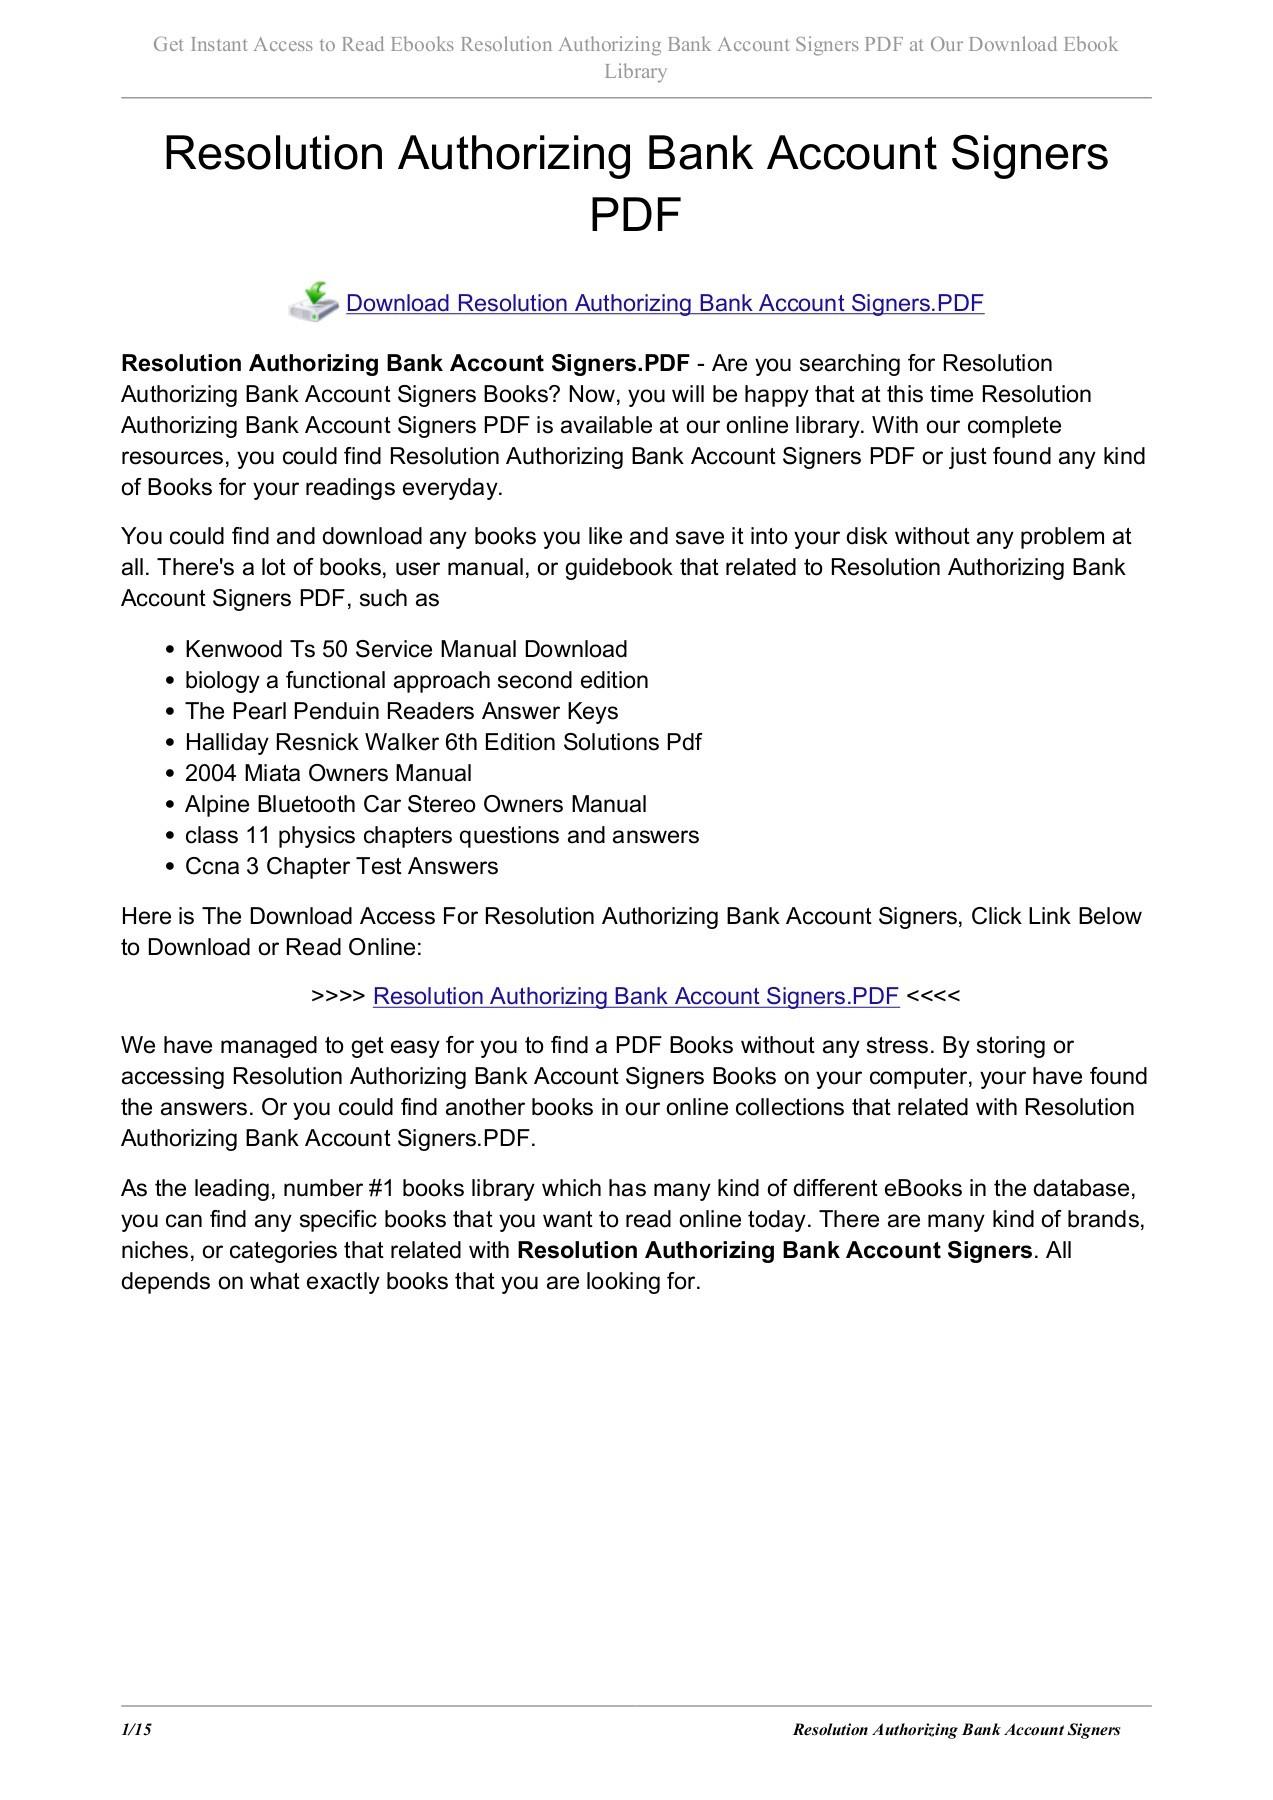 ... Array - ibm p70 manual ebook rh ibm p70 manual ebook logoutev de